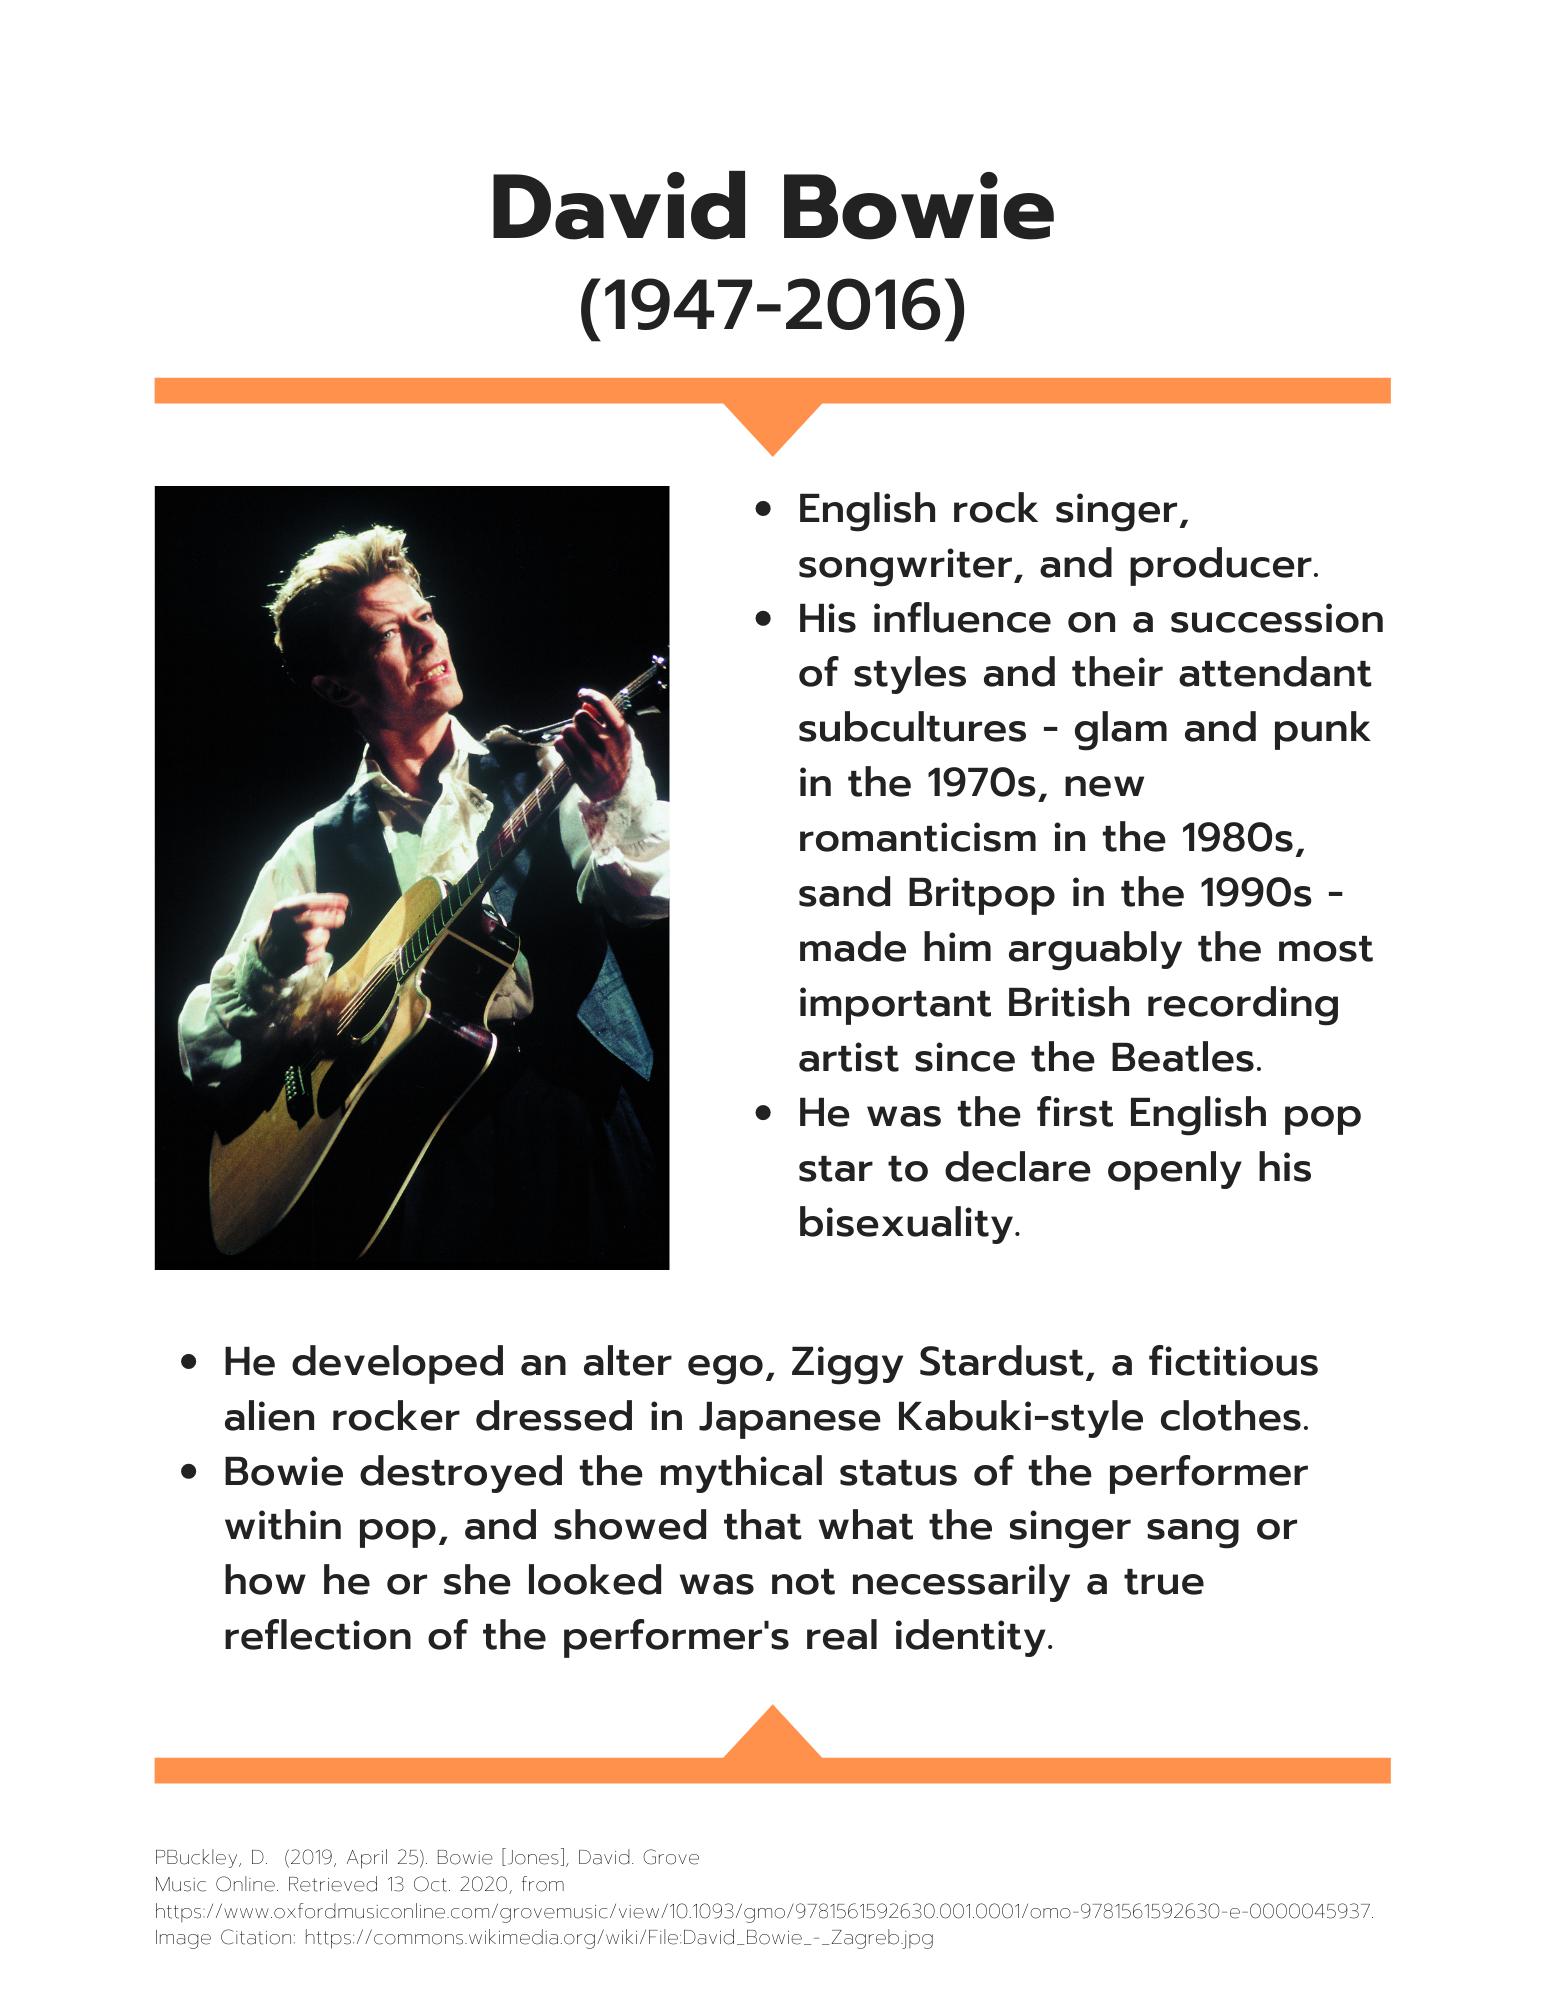 David Bowie information sheet art